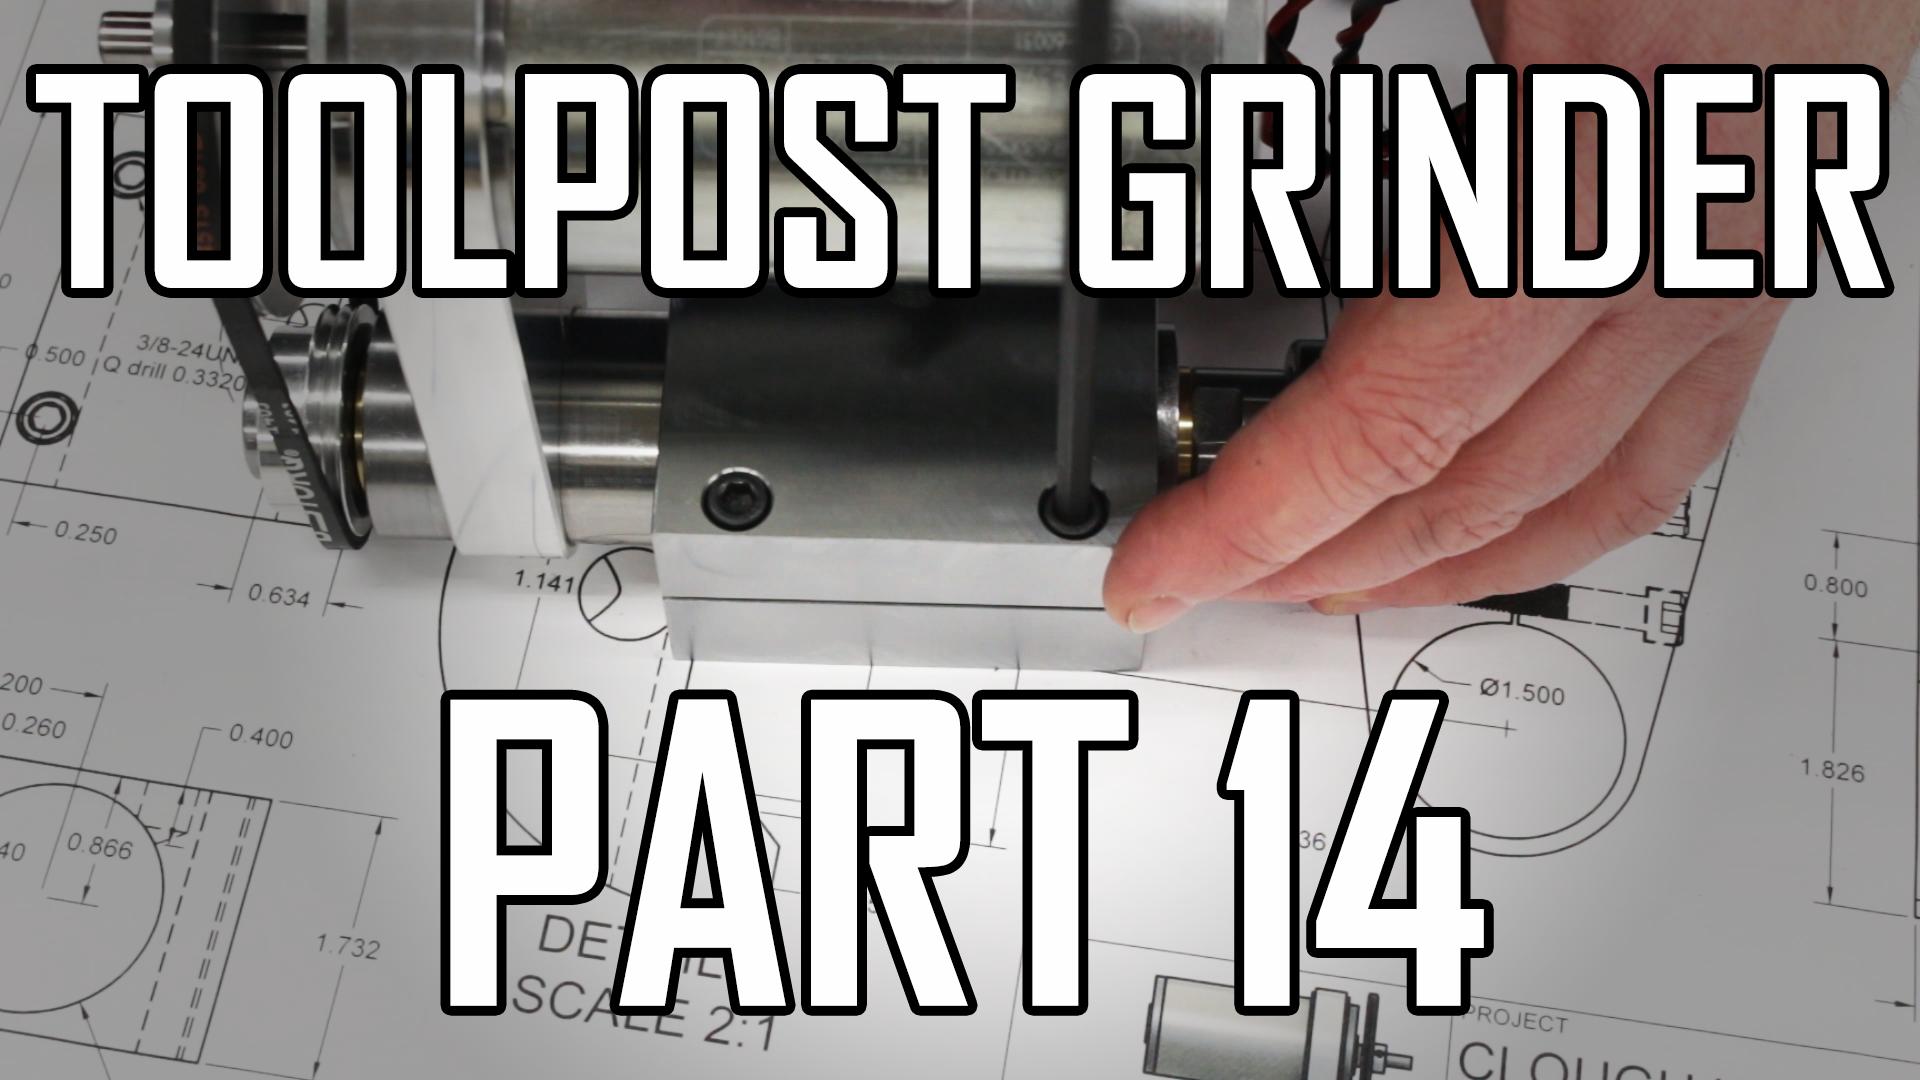 Toolpost Grinder Part 14: Motor Clamp 3